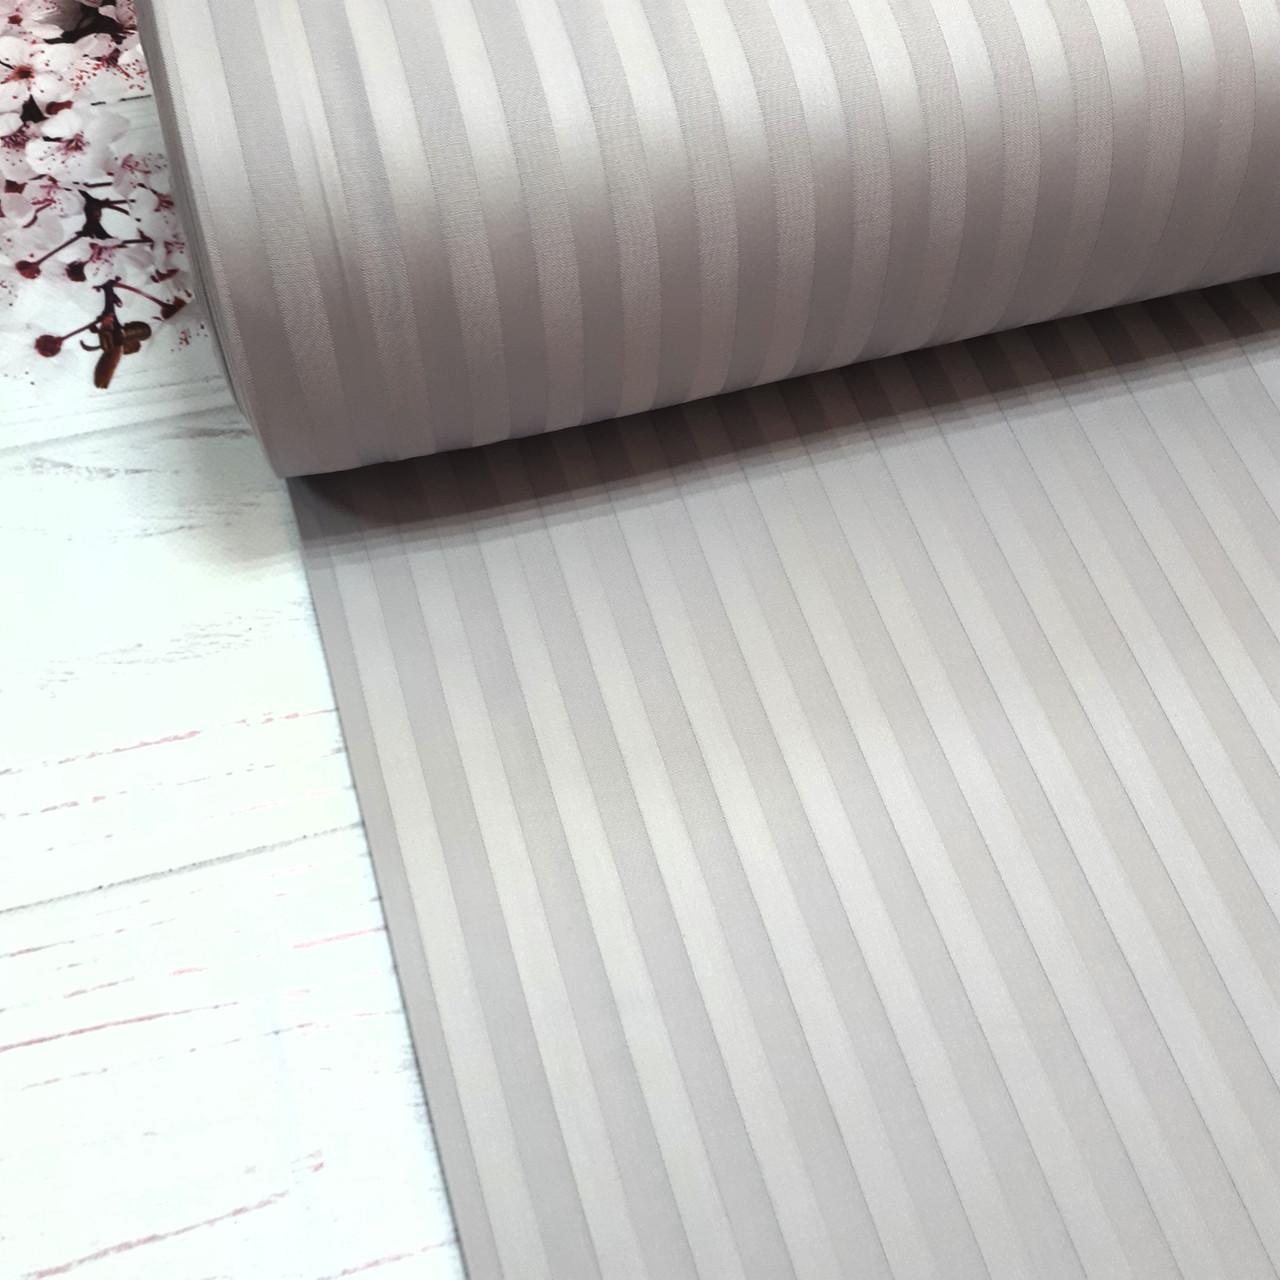 Сатин 100% хлопок  (ТУРЦИЯ шир. 2,4 м) Stripes серый ОТРЕЗ(0,4*2,4м)